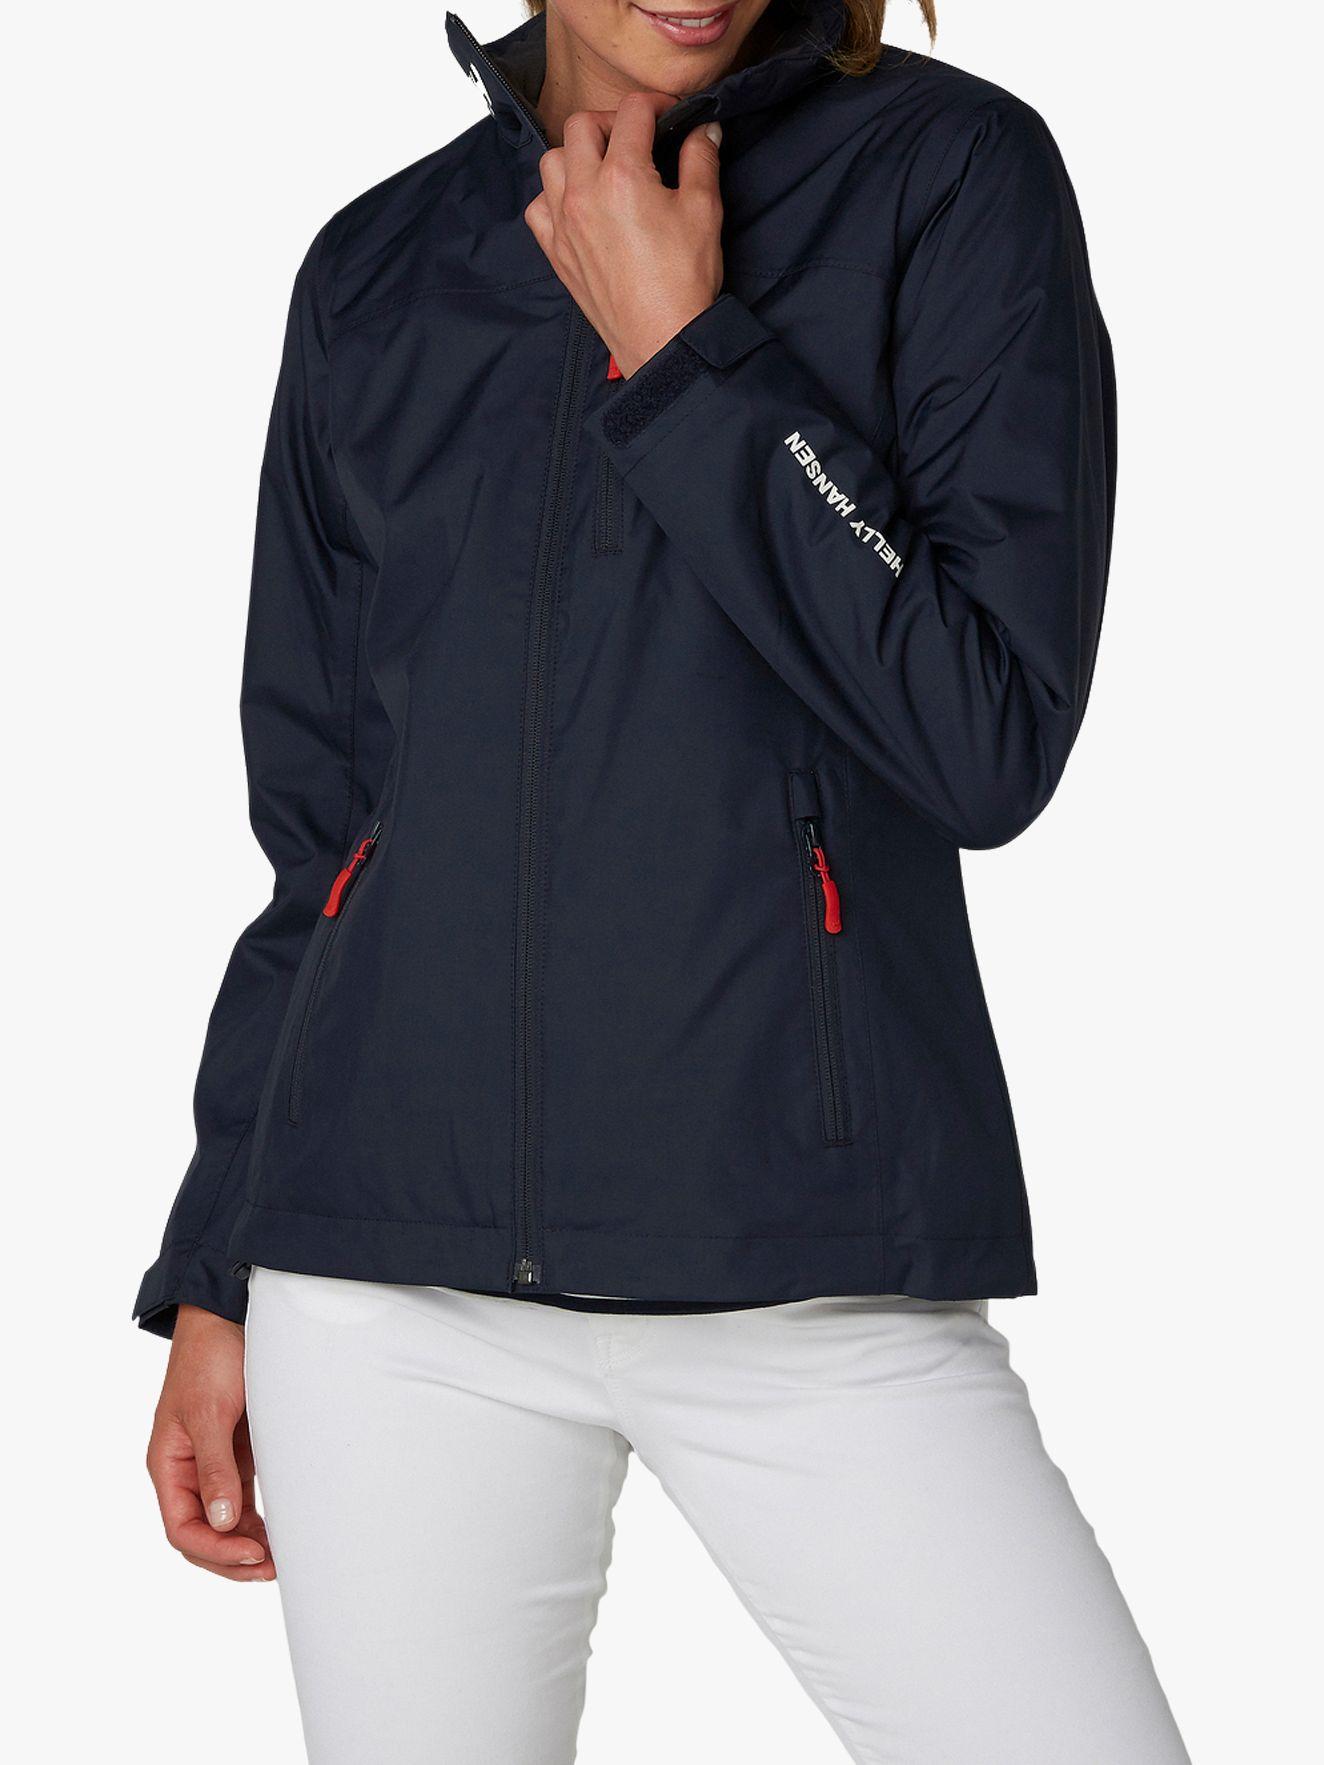 Helly Hansen Helly Hansen Crew Midlayer Women's Waterproof Jacket